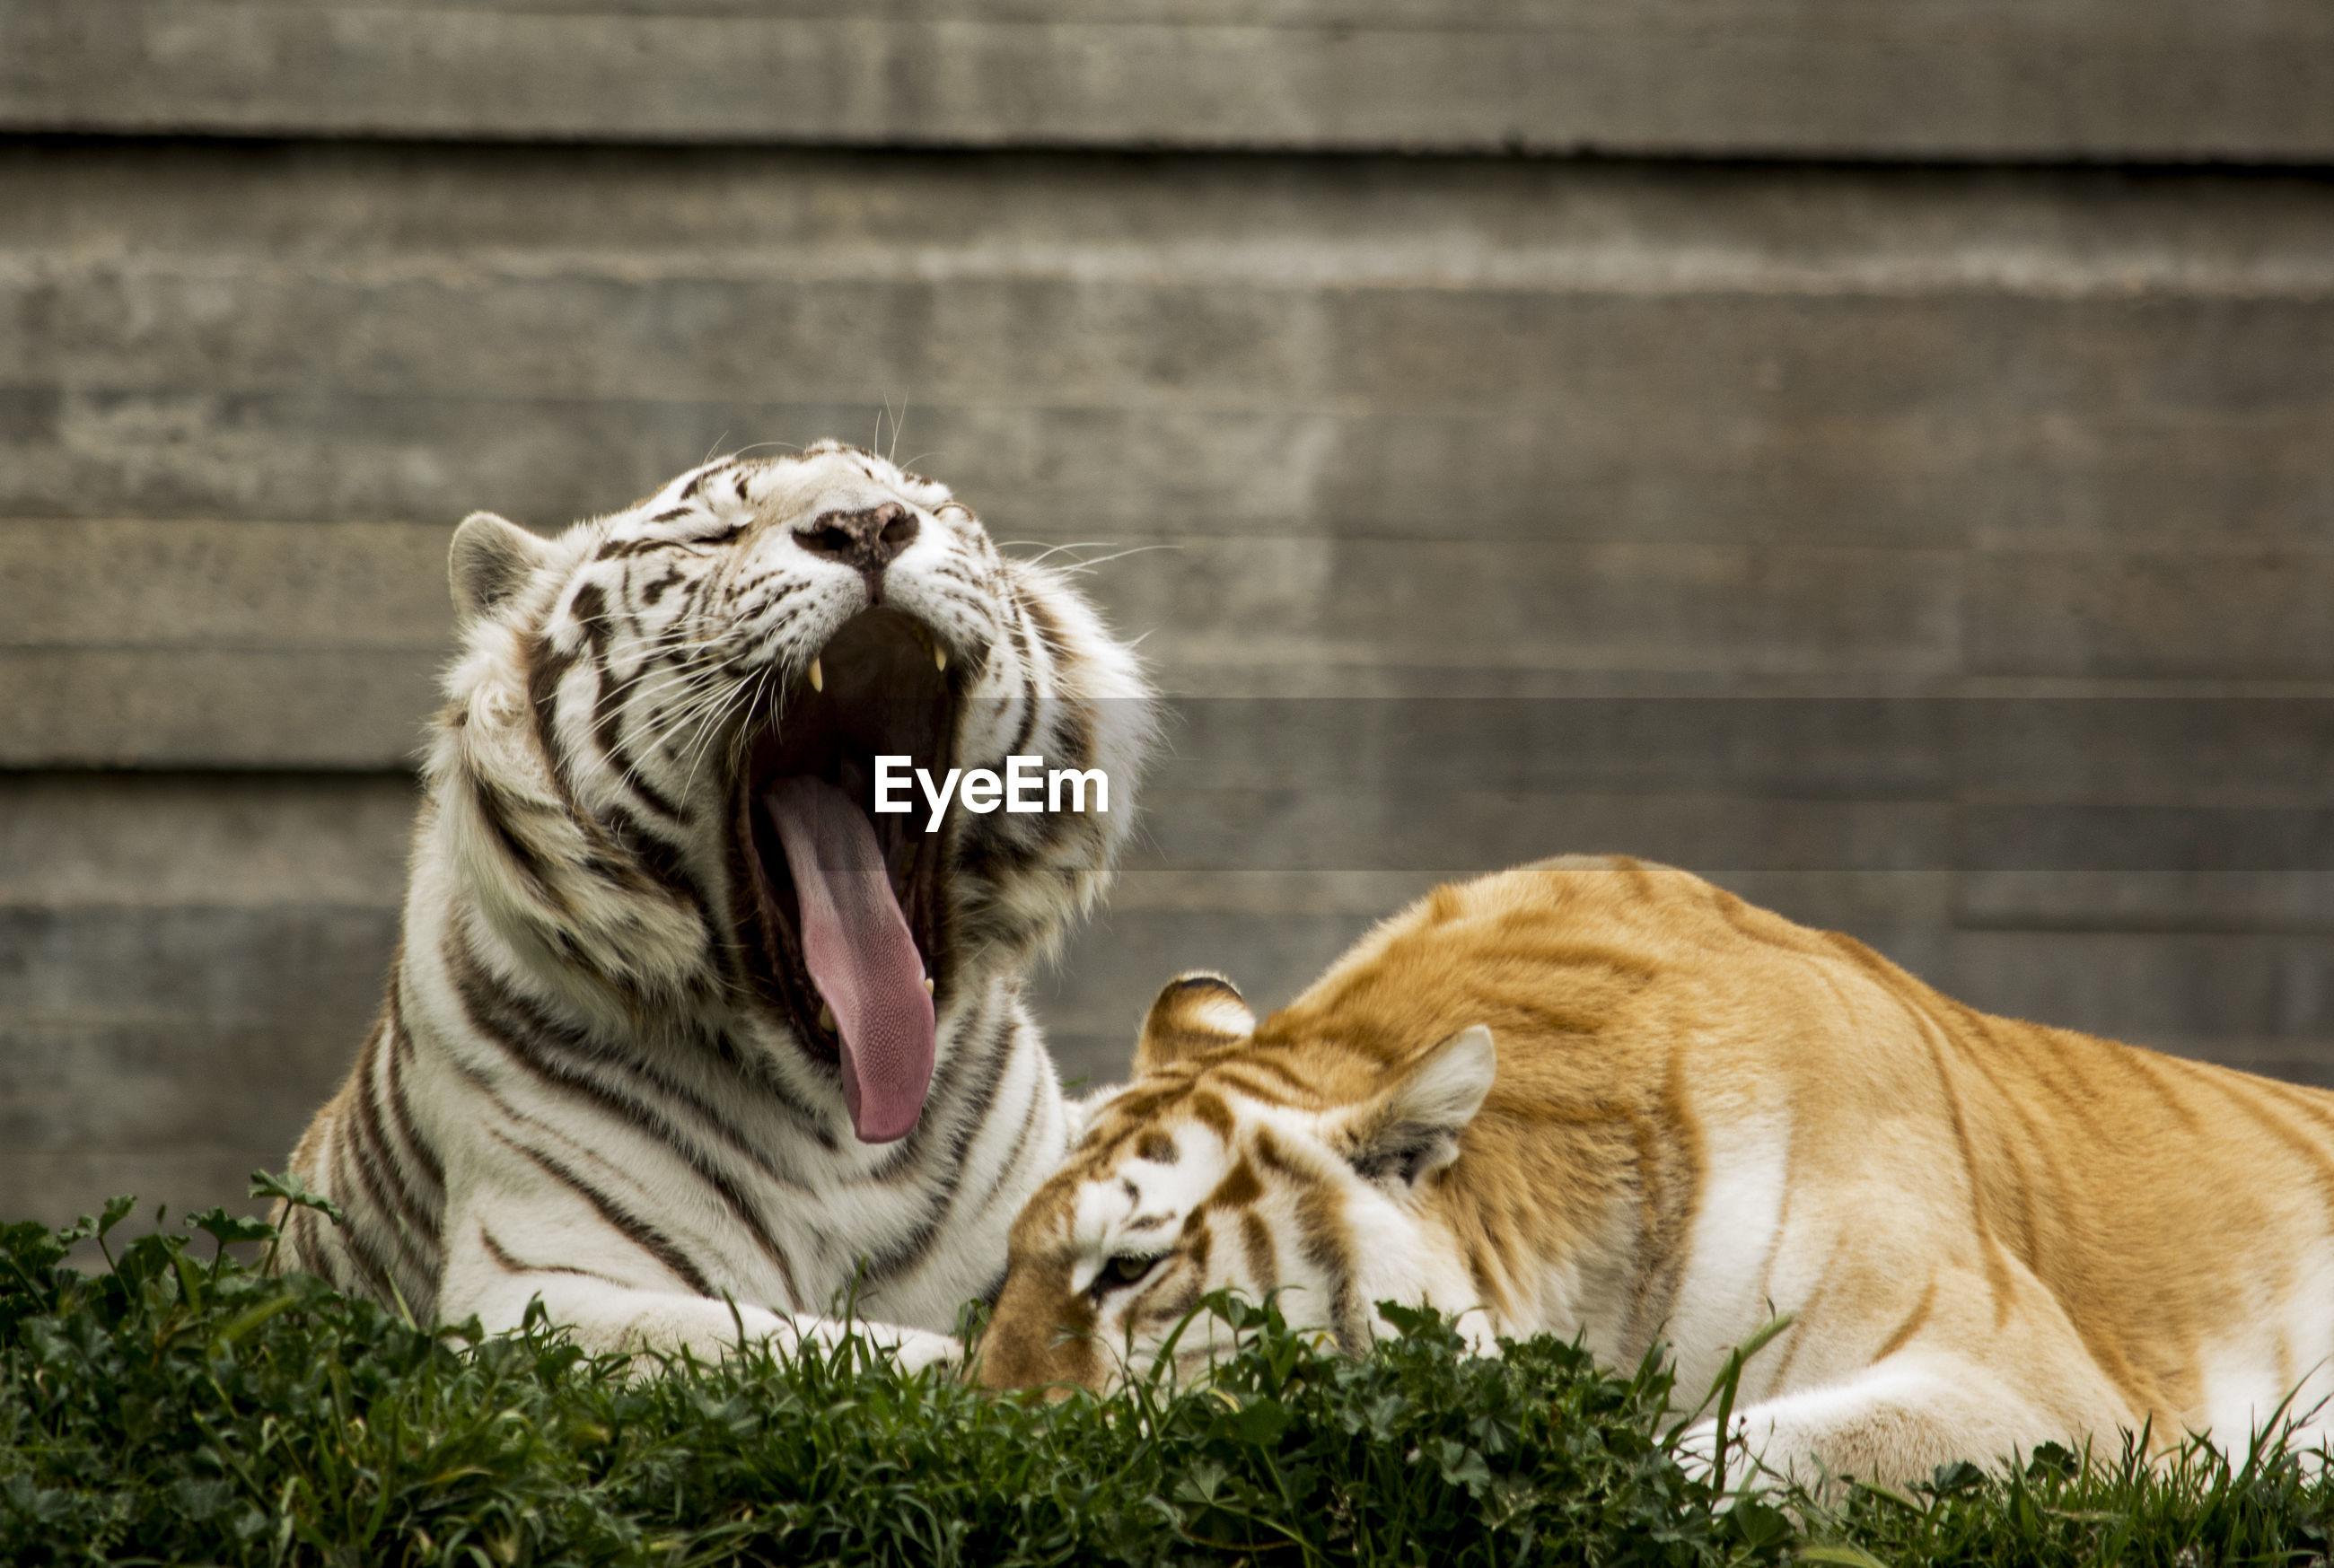 Tigers sitting on grass